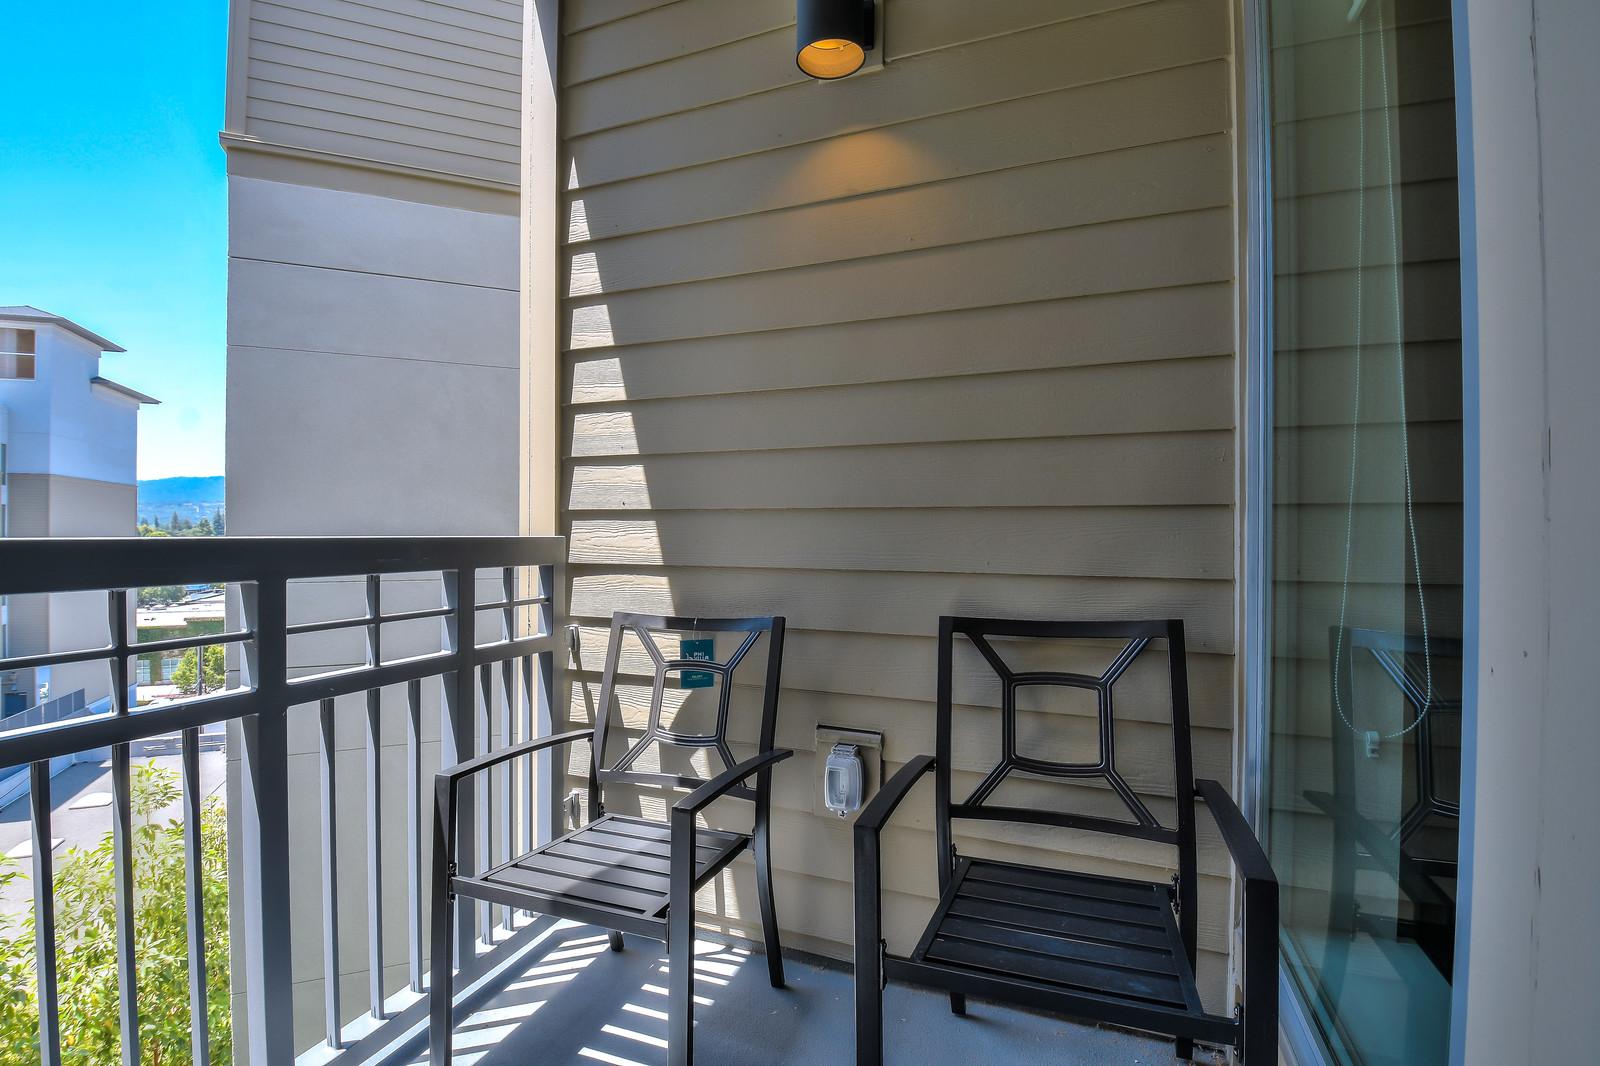 Balcony at Franklin 299 Apartments